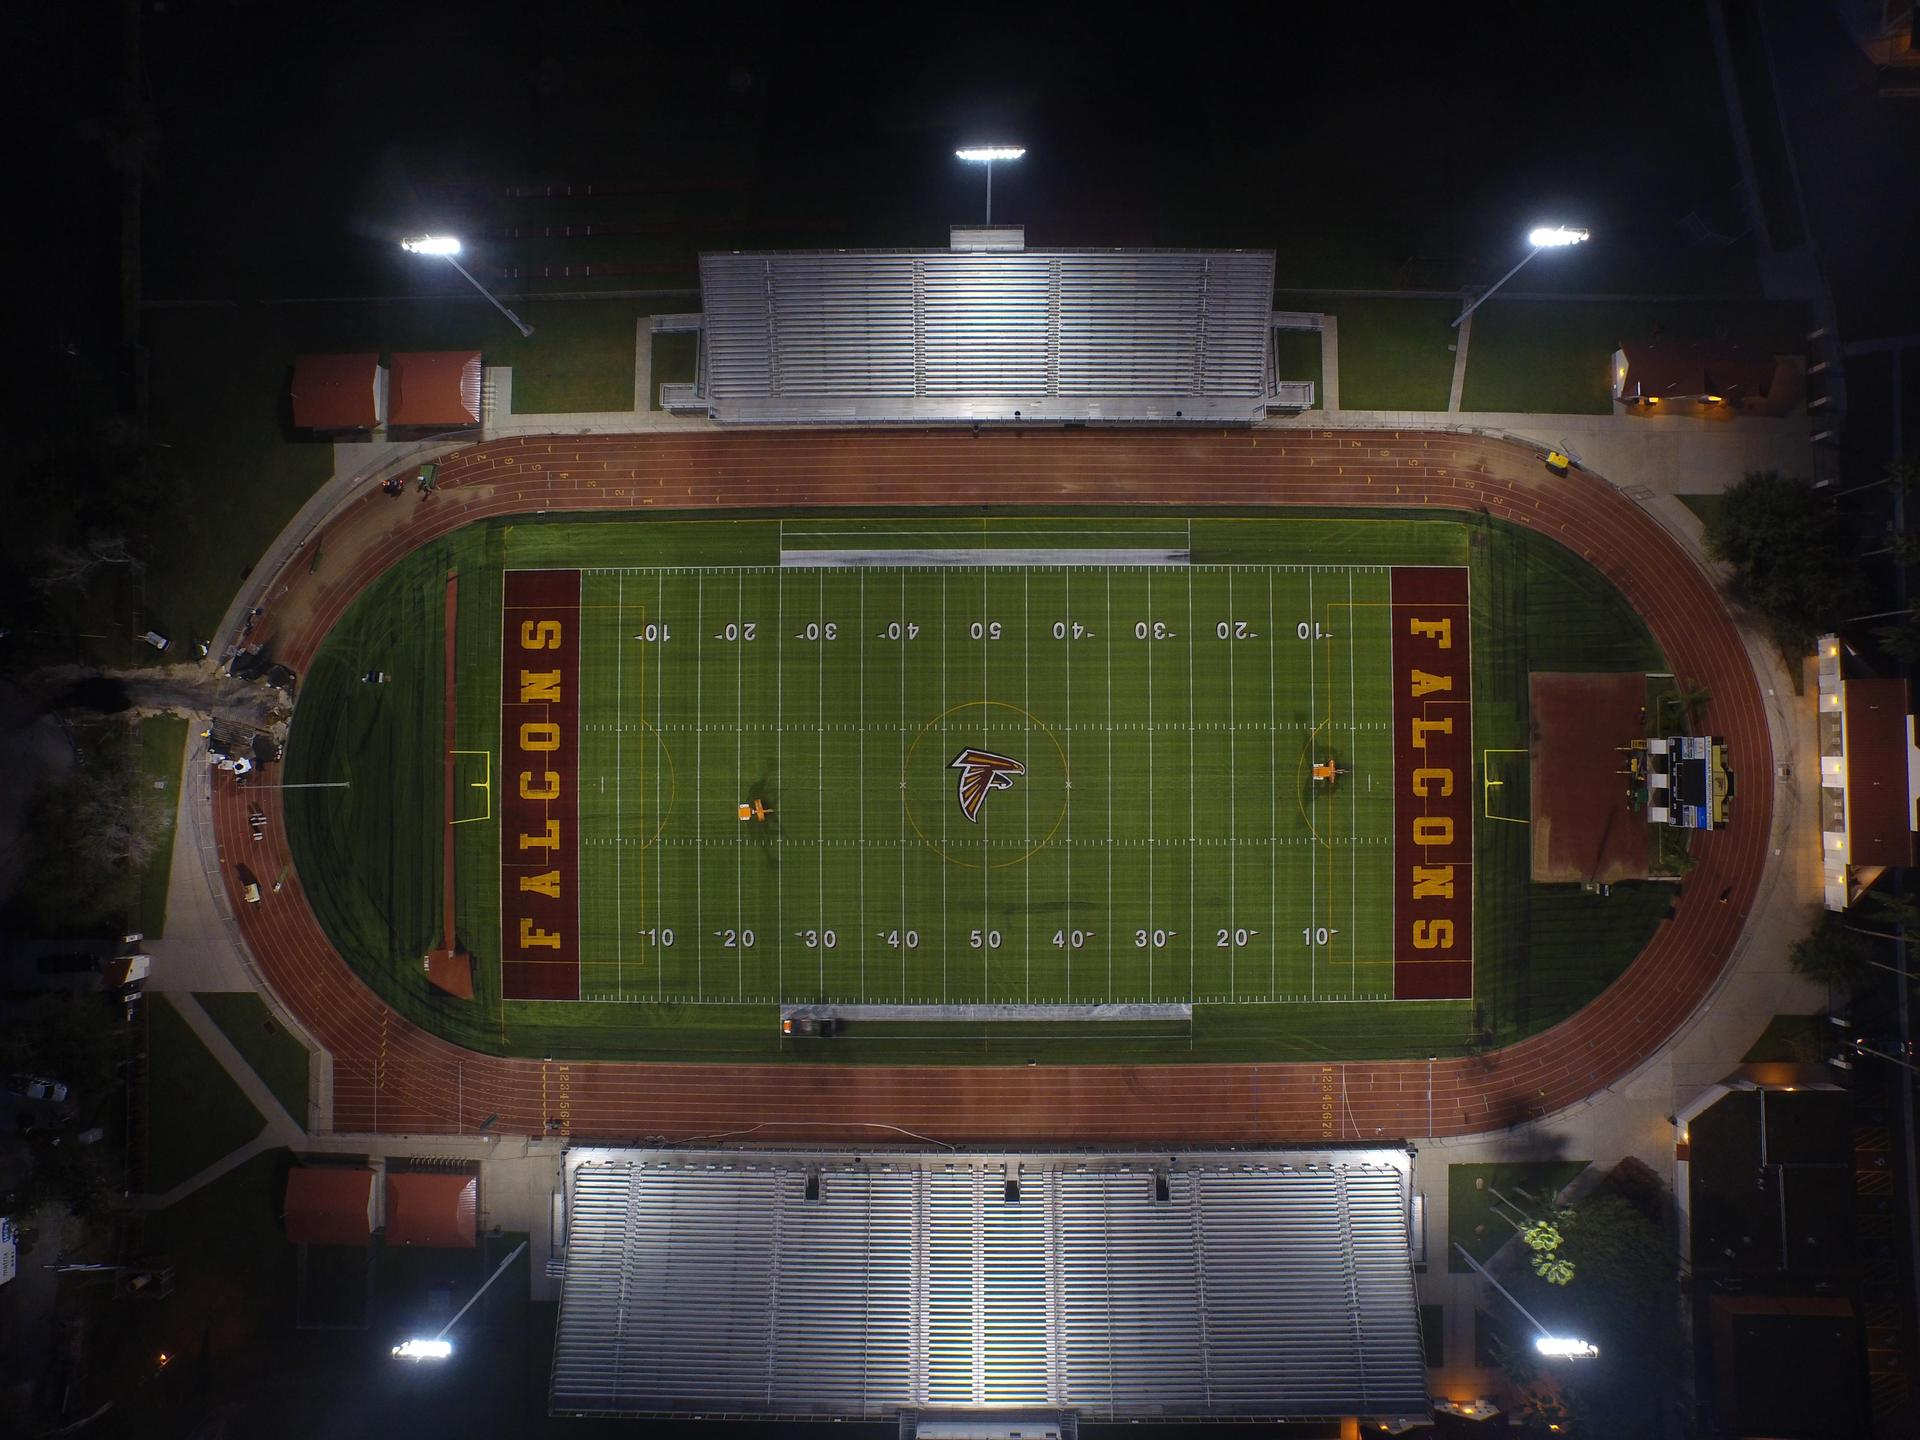 Stadium top view